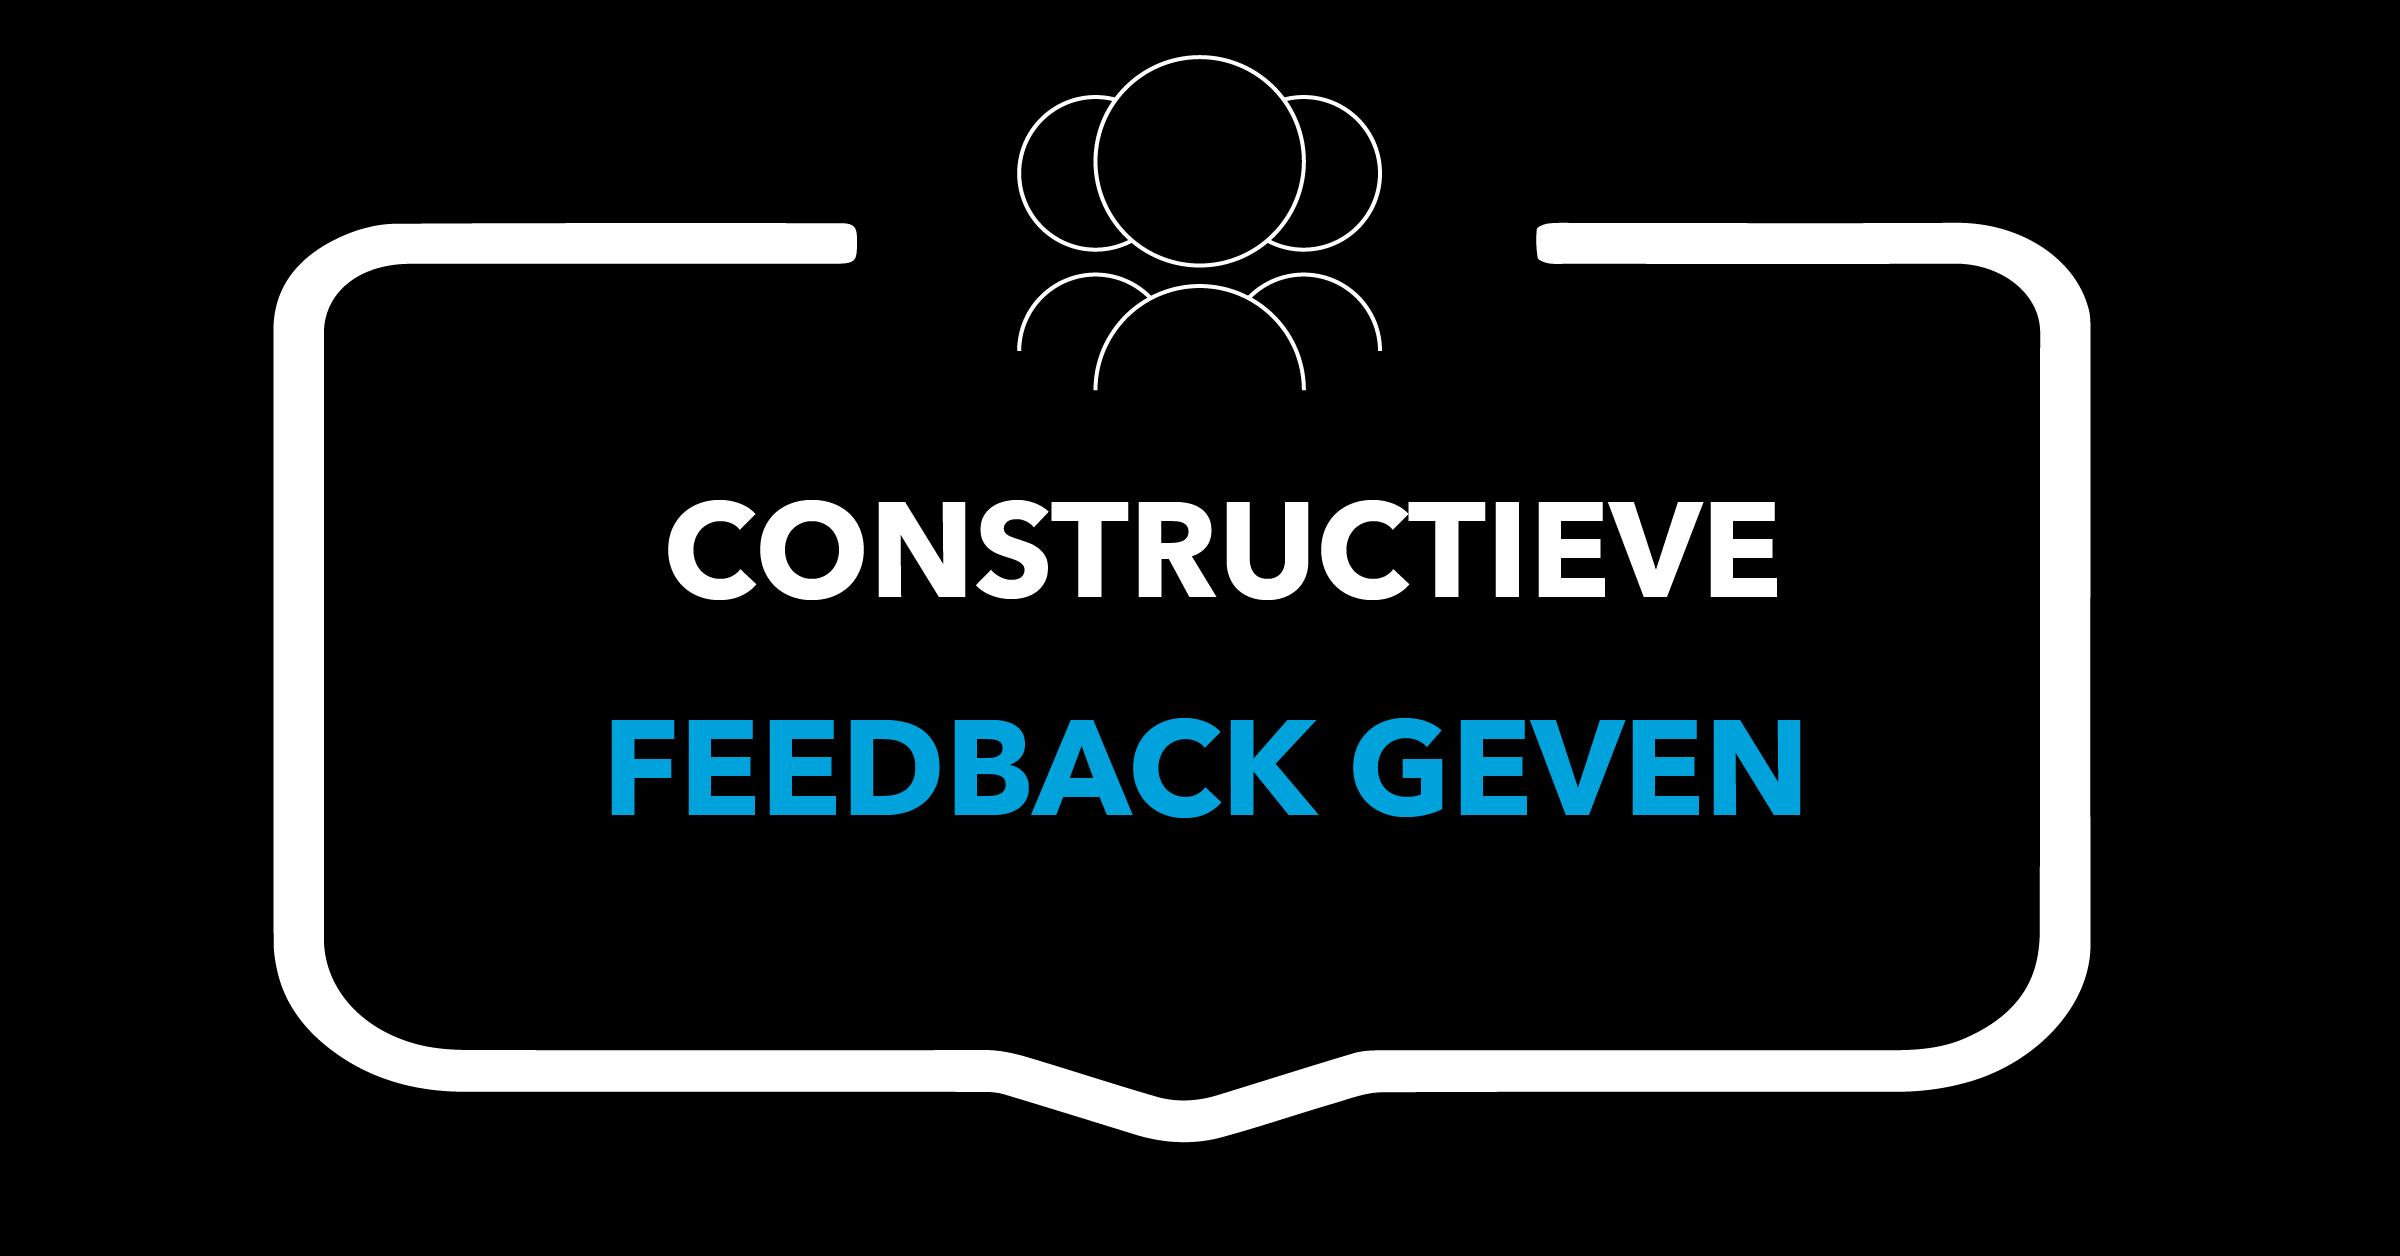 Constructieve-feedback-geven